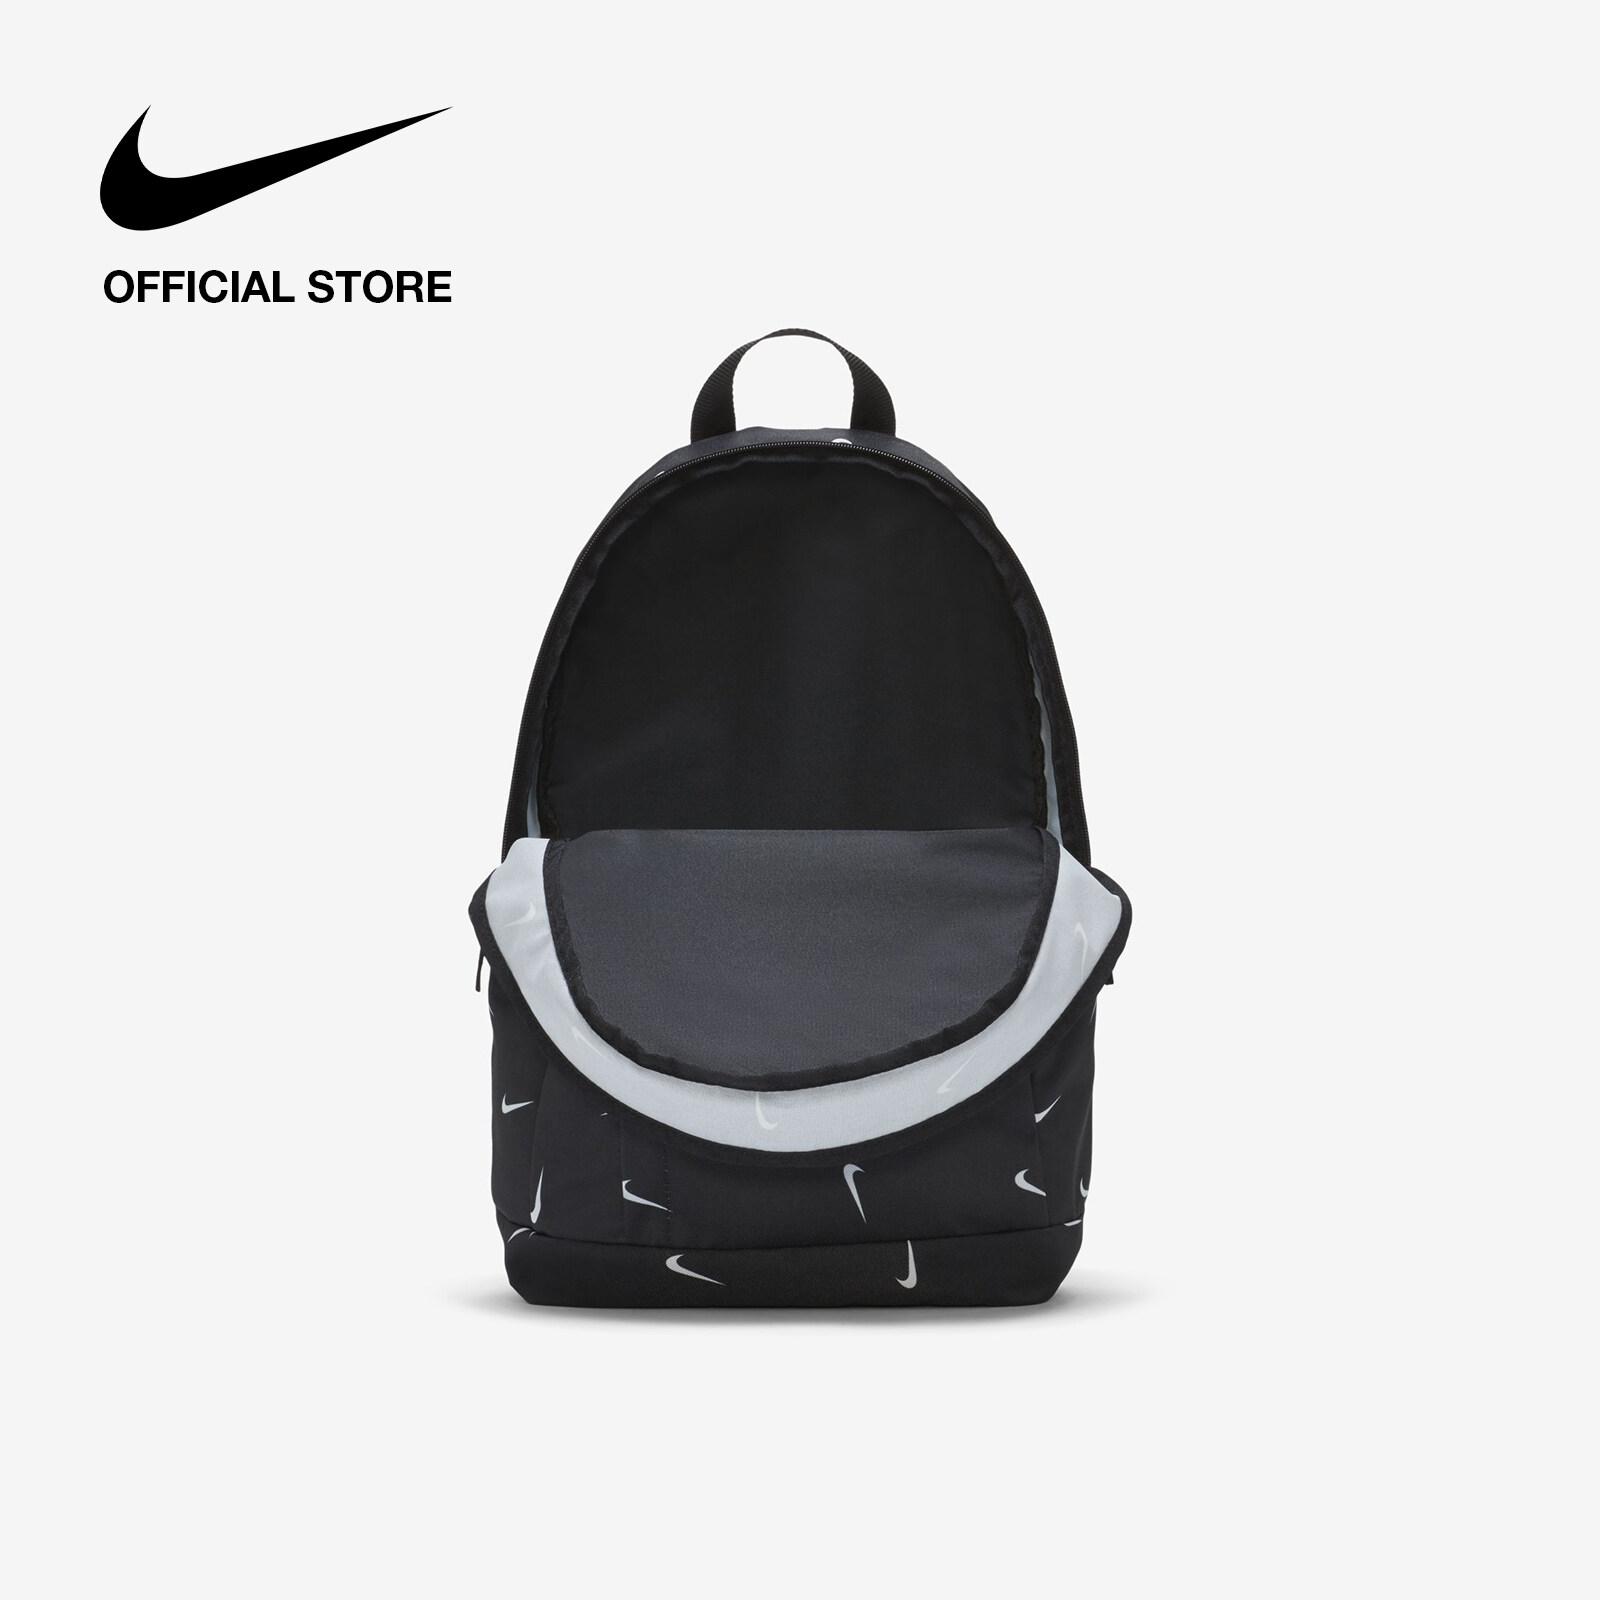 Nike Unisex Elemental Backpack - Black ไนกี้ เป้สะพายหลังยูนิเซ็กส์ เอลิเมนทัล - สีดำ